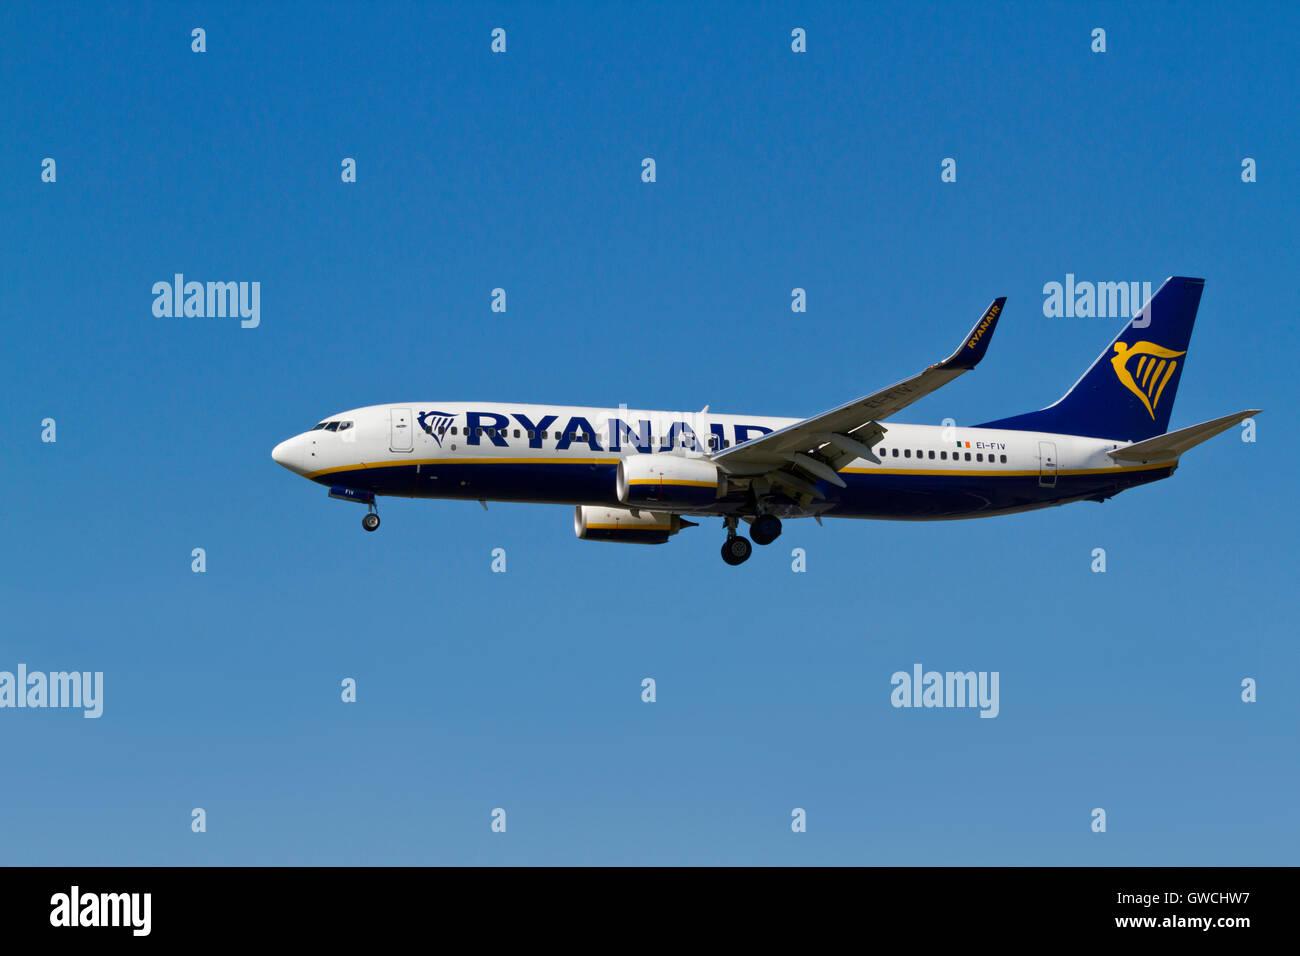 RYANAIR, Boeing 737, EI-FIV, flight FR2679 from Luton, London, on final approach to Kastrup Airport, CPH, Copenhagen, - Stock Image